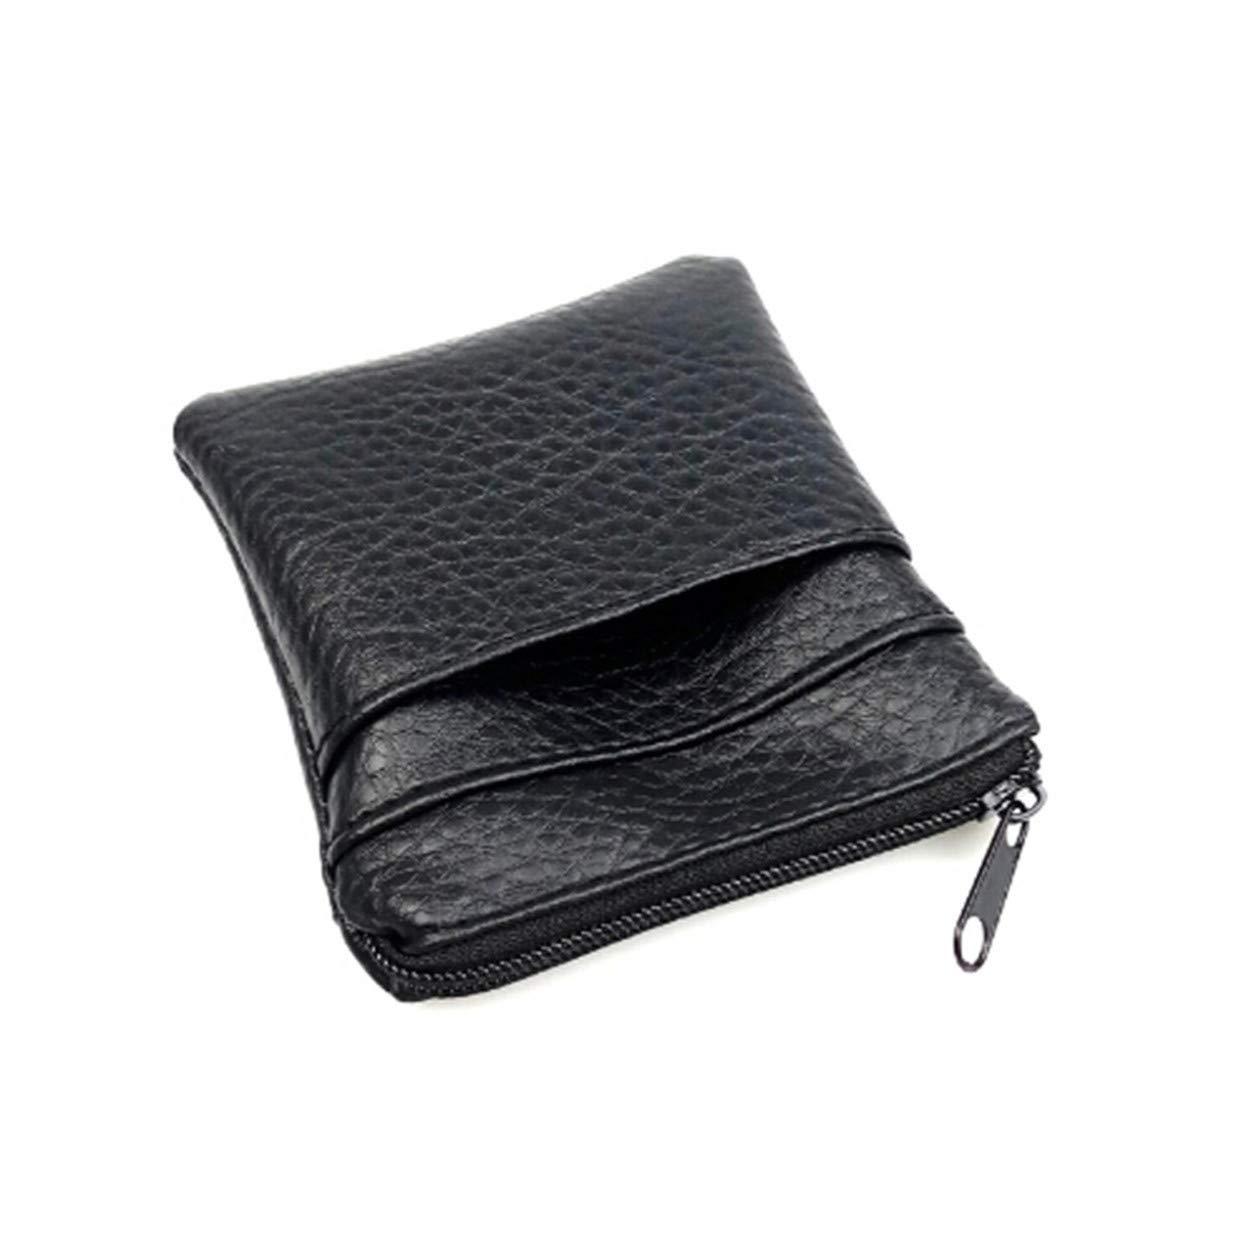 LALANG Women Men Mini Coin Purse Short Wallet Bags Key Credit Card Pouch Holder